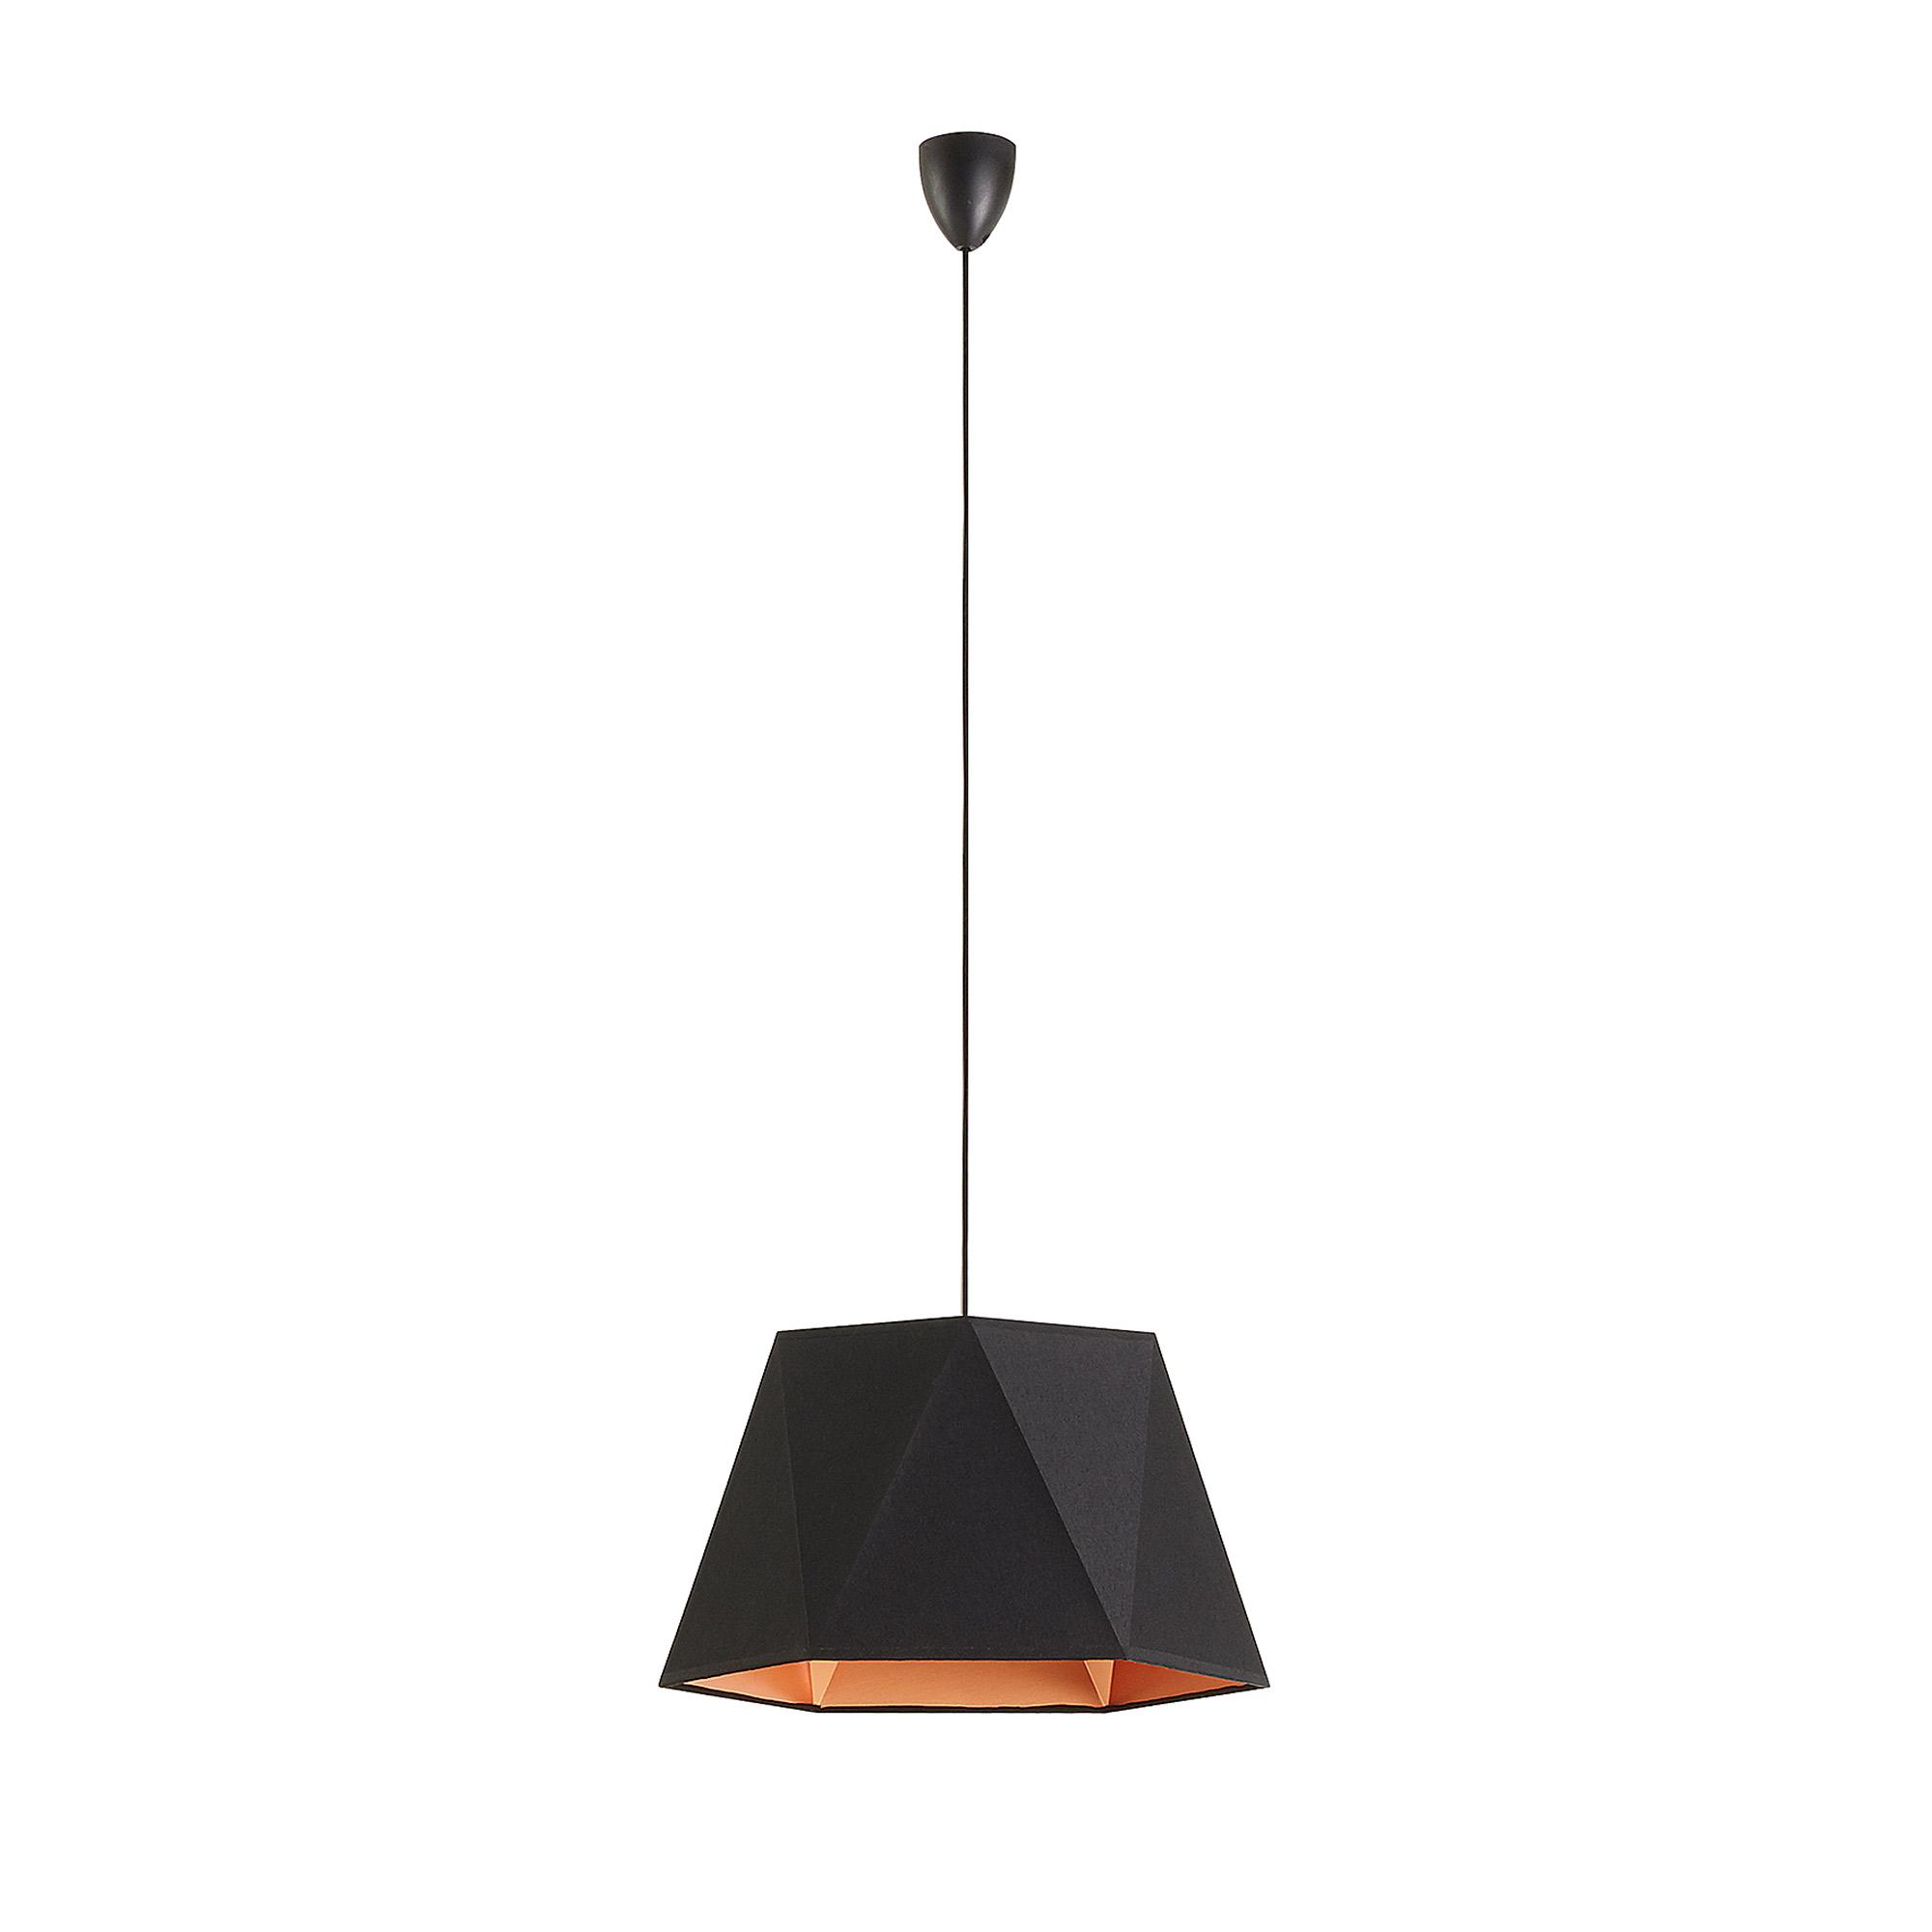 laforma – Laforma neil loftlampe - sort/kobber stof/metal fra boboonline.dk